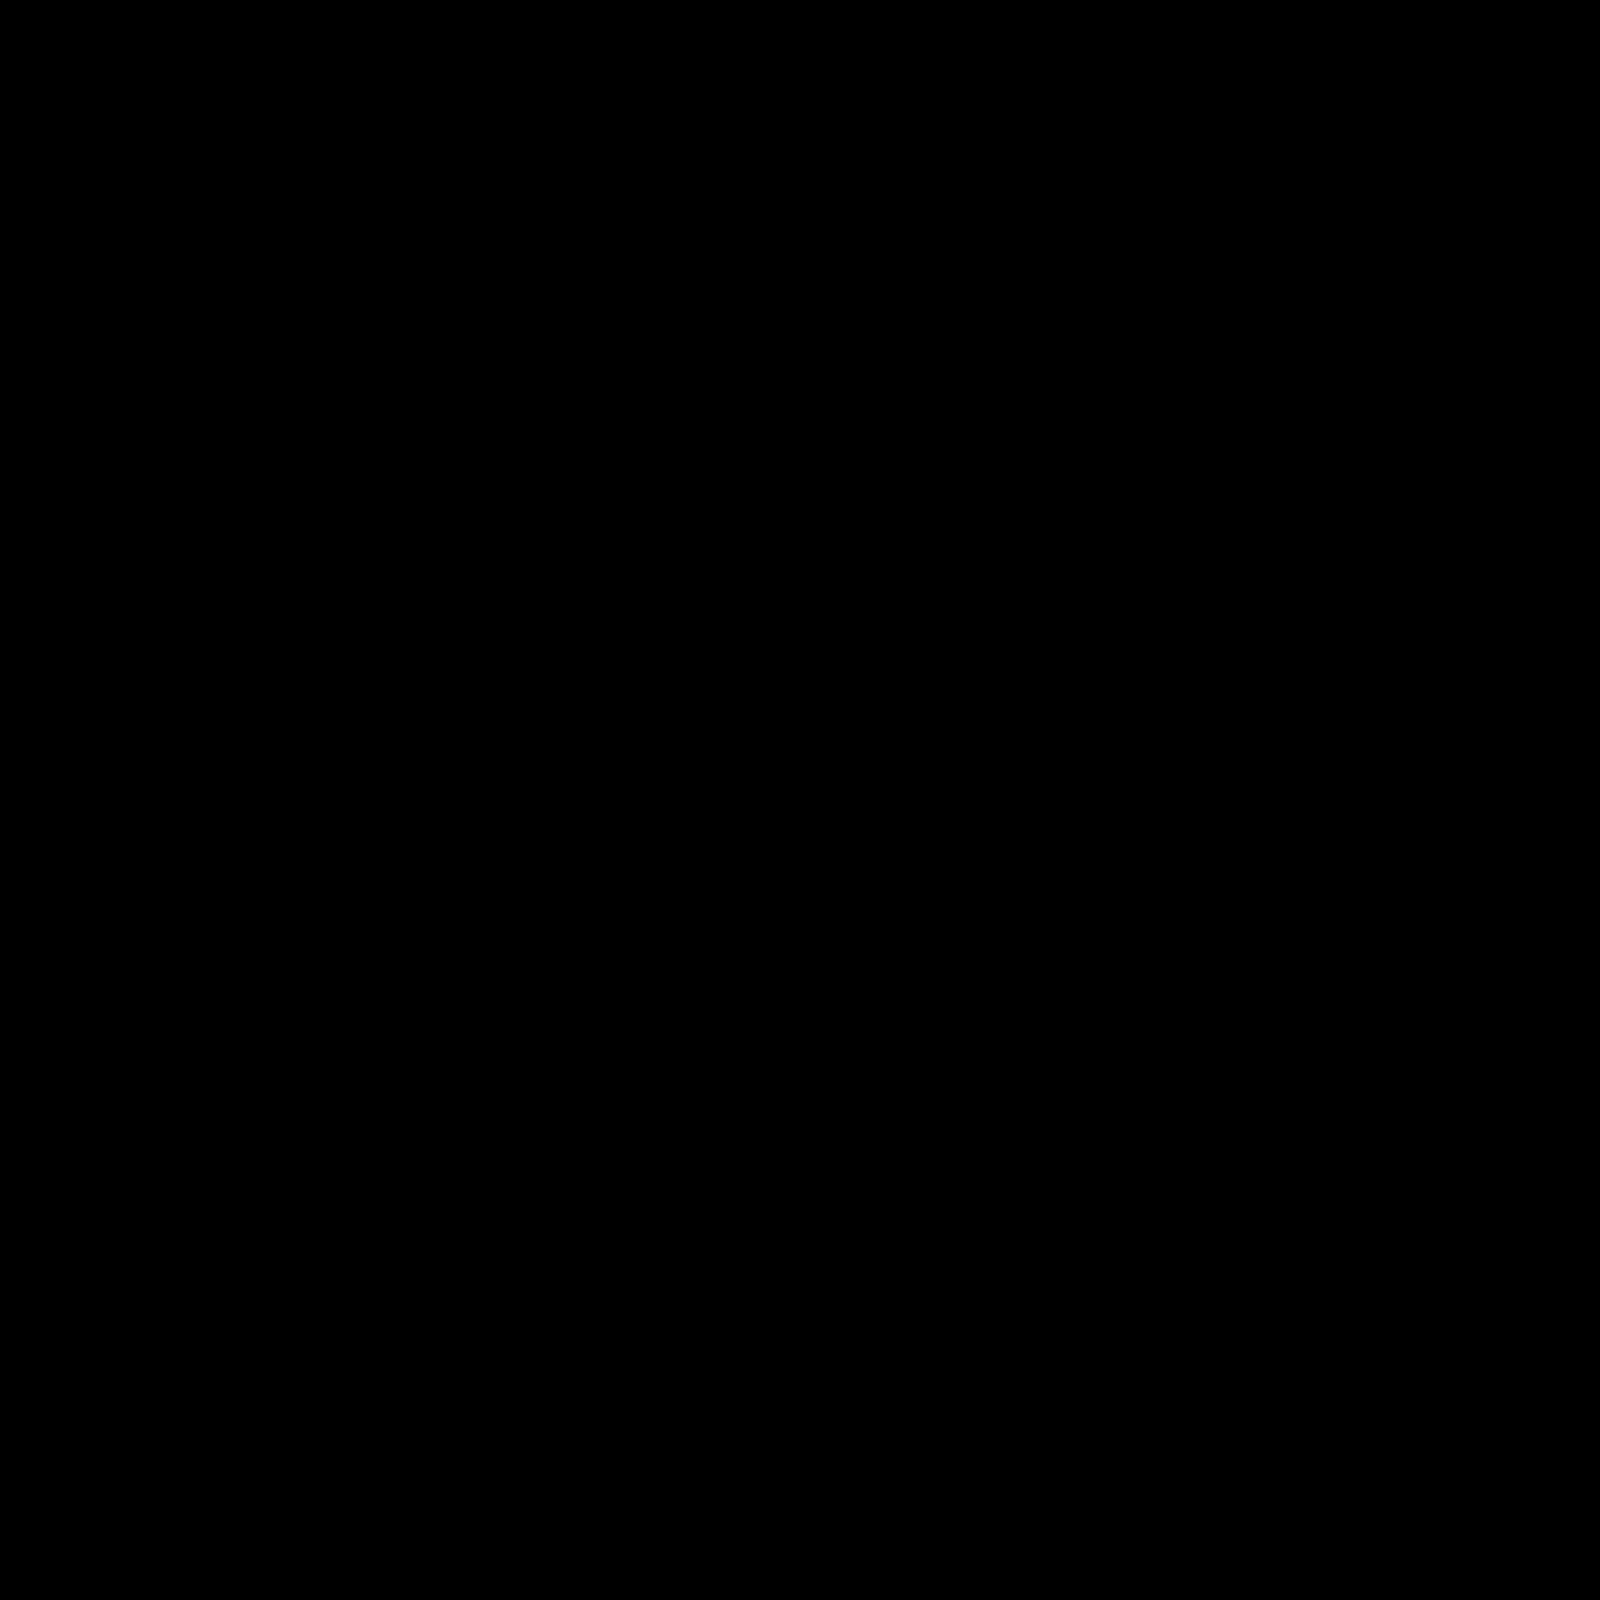 Ballroom Dance Filled icon